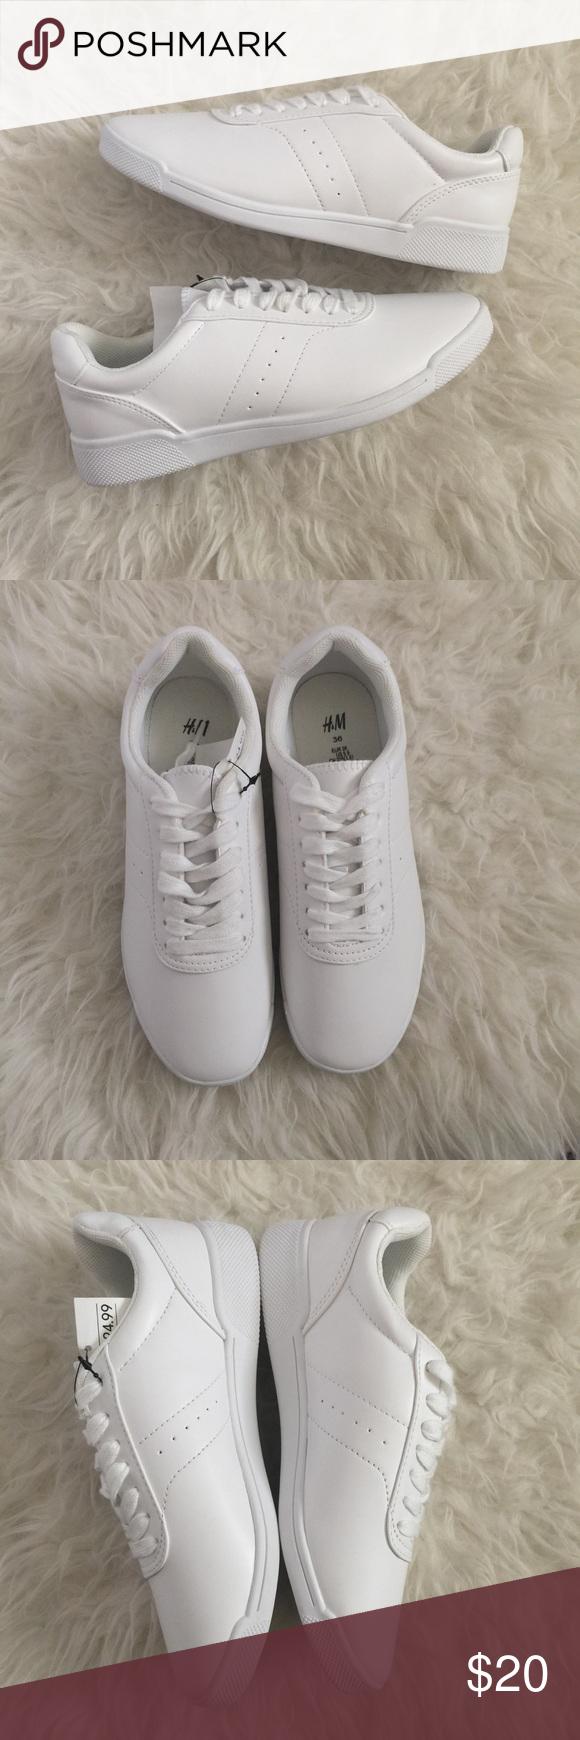 H\u0026M white tennis shoes. New white